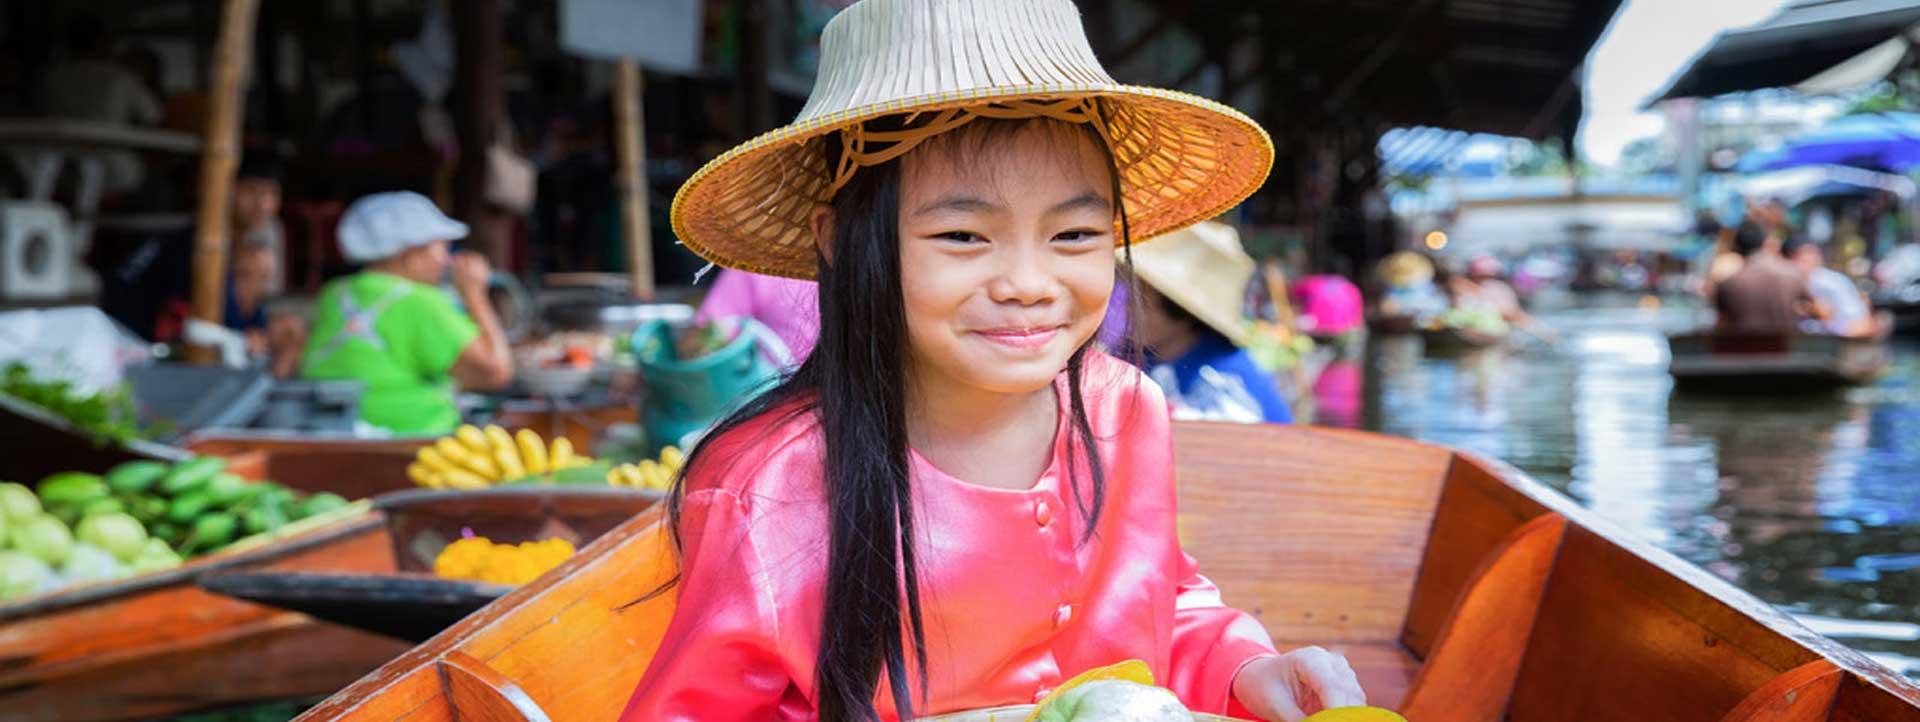 VIETNAM-FLOATING-MARKETS-little-girl